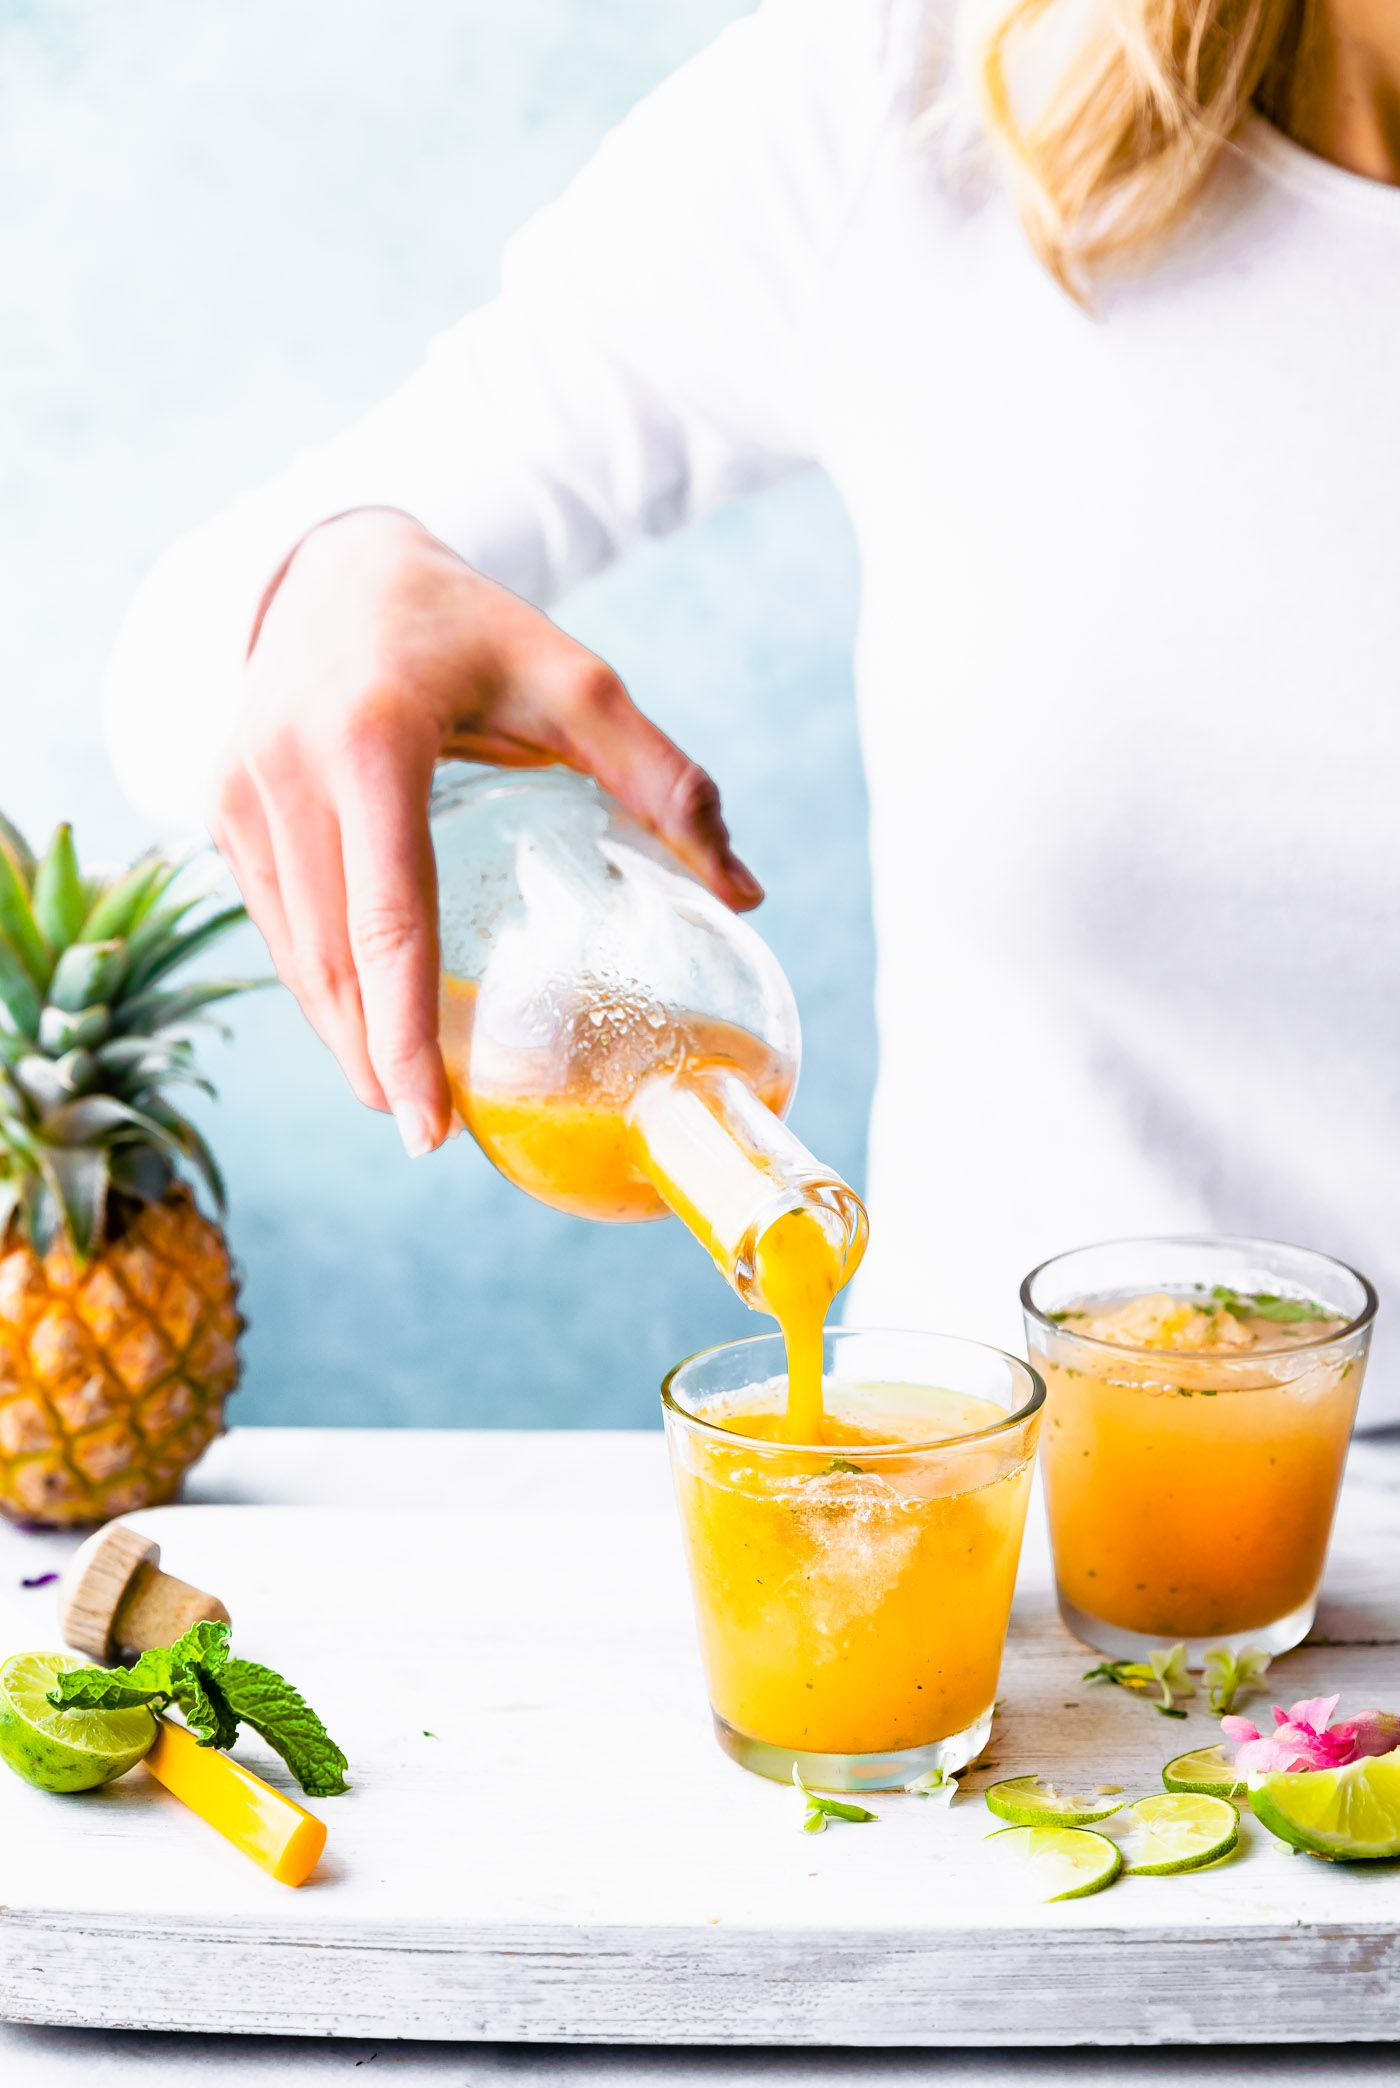 Turmeric Pineapple Apple Cider Vinegar Drink Detox Shrub Cocktail